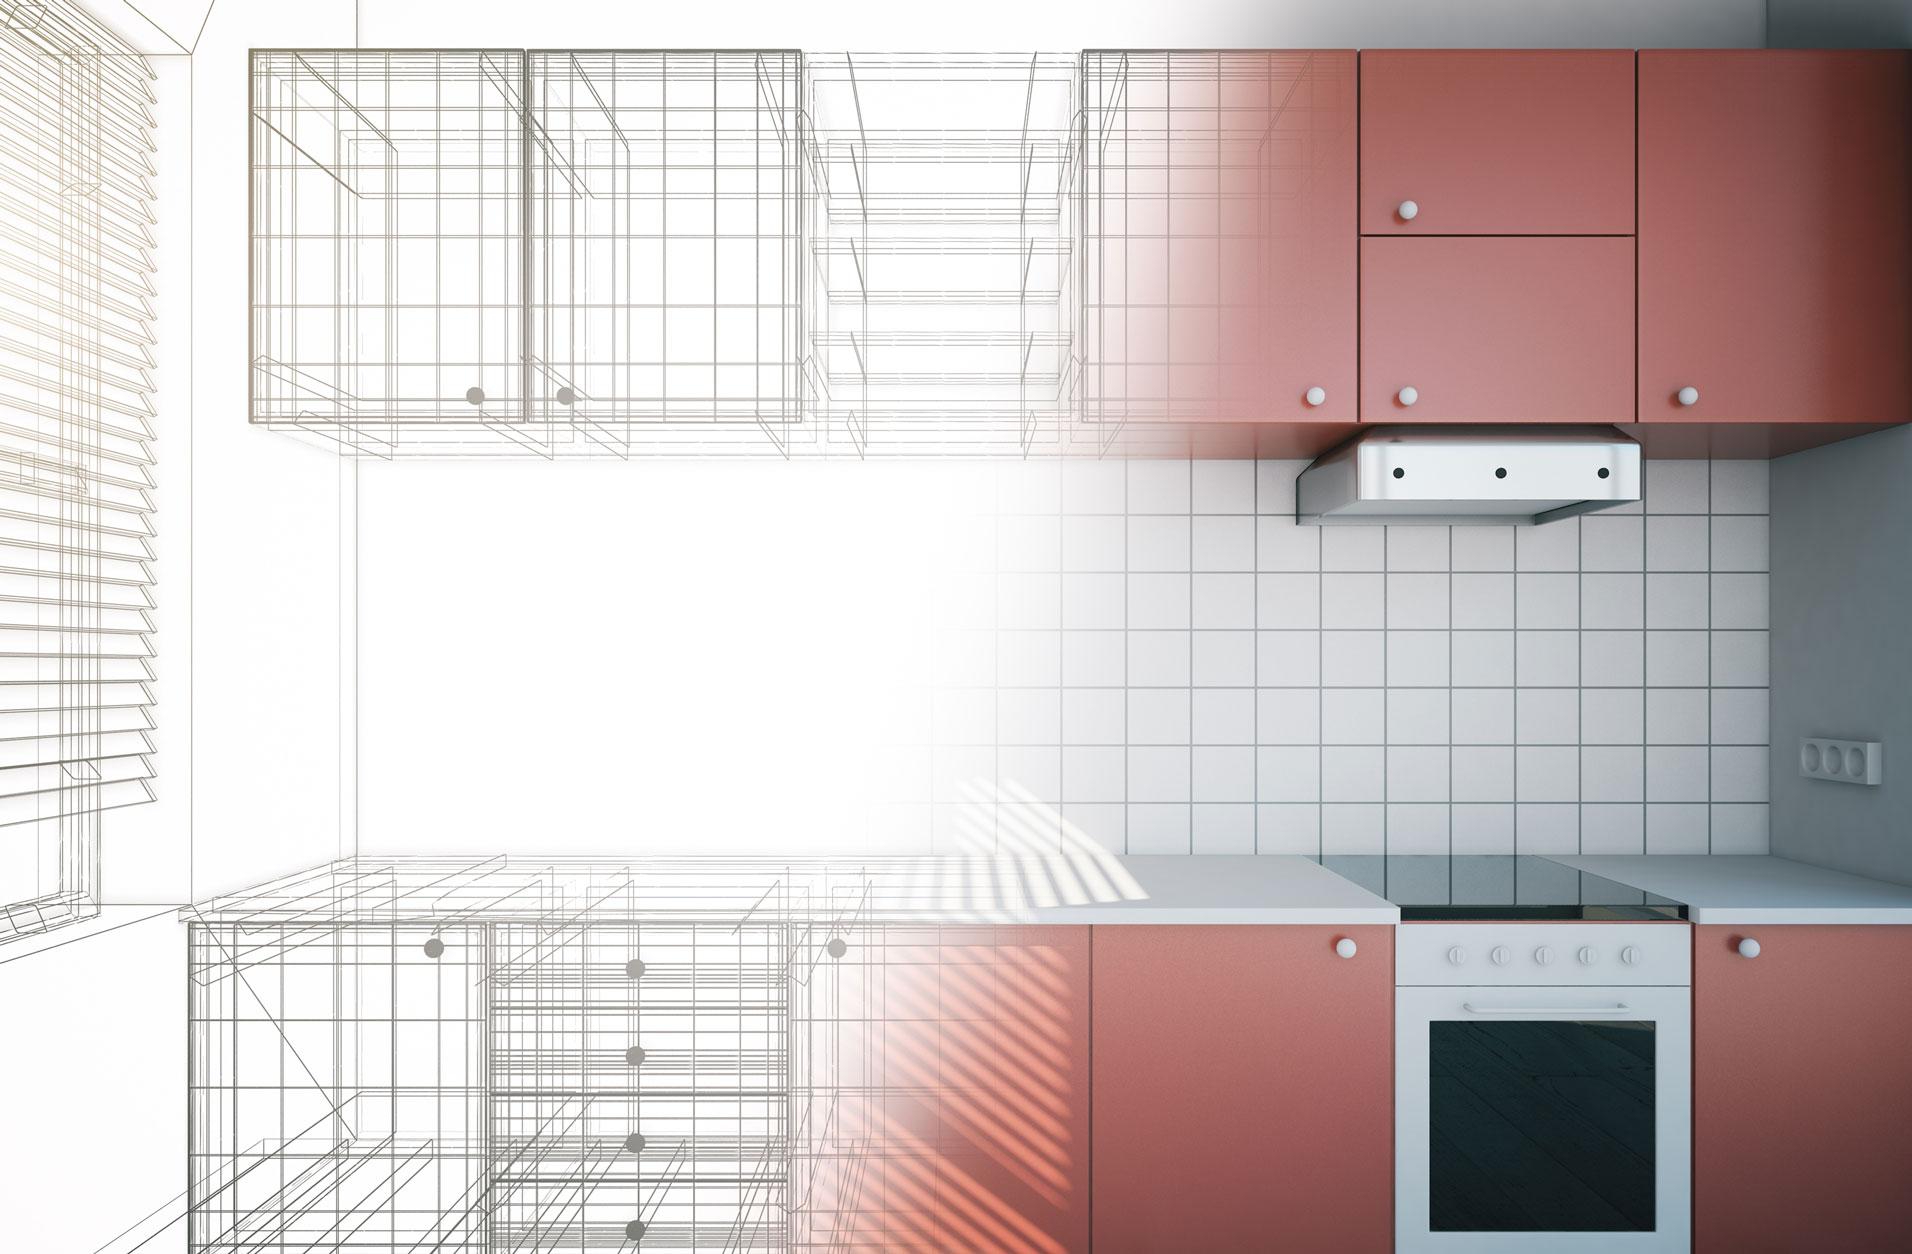 armoires super prix ou grande surface armoires. Black Bedroom Furniture Sets. Home Design Ideas